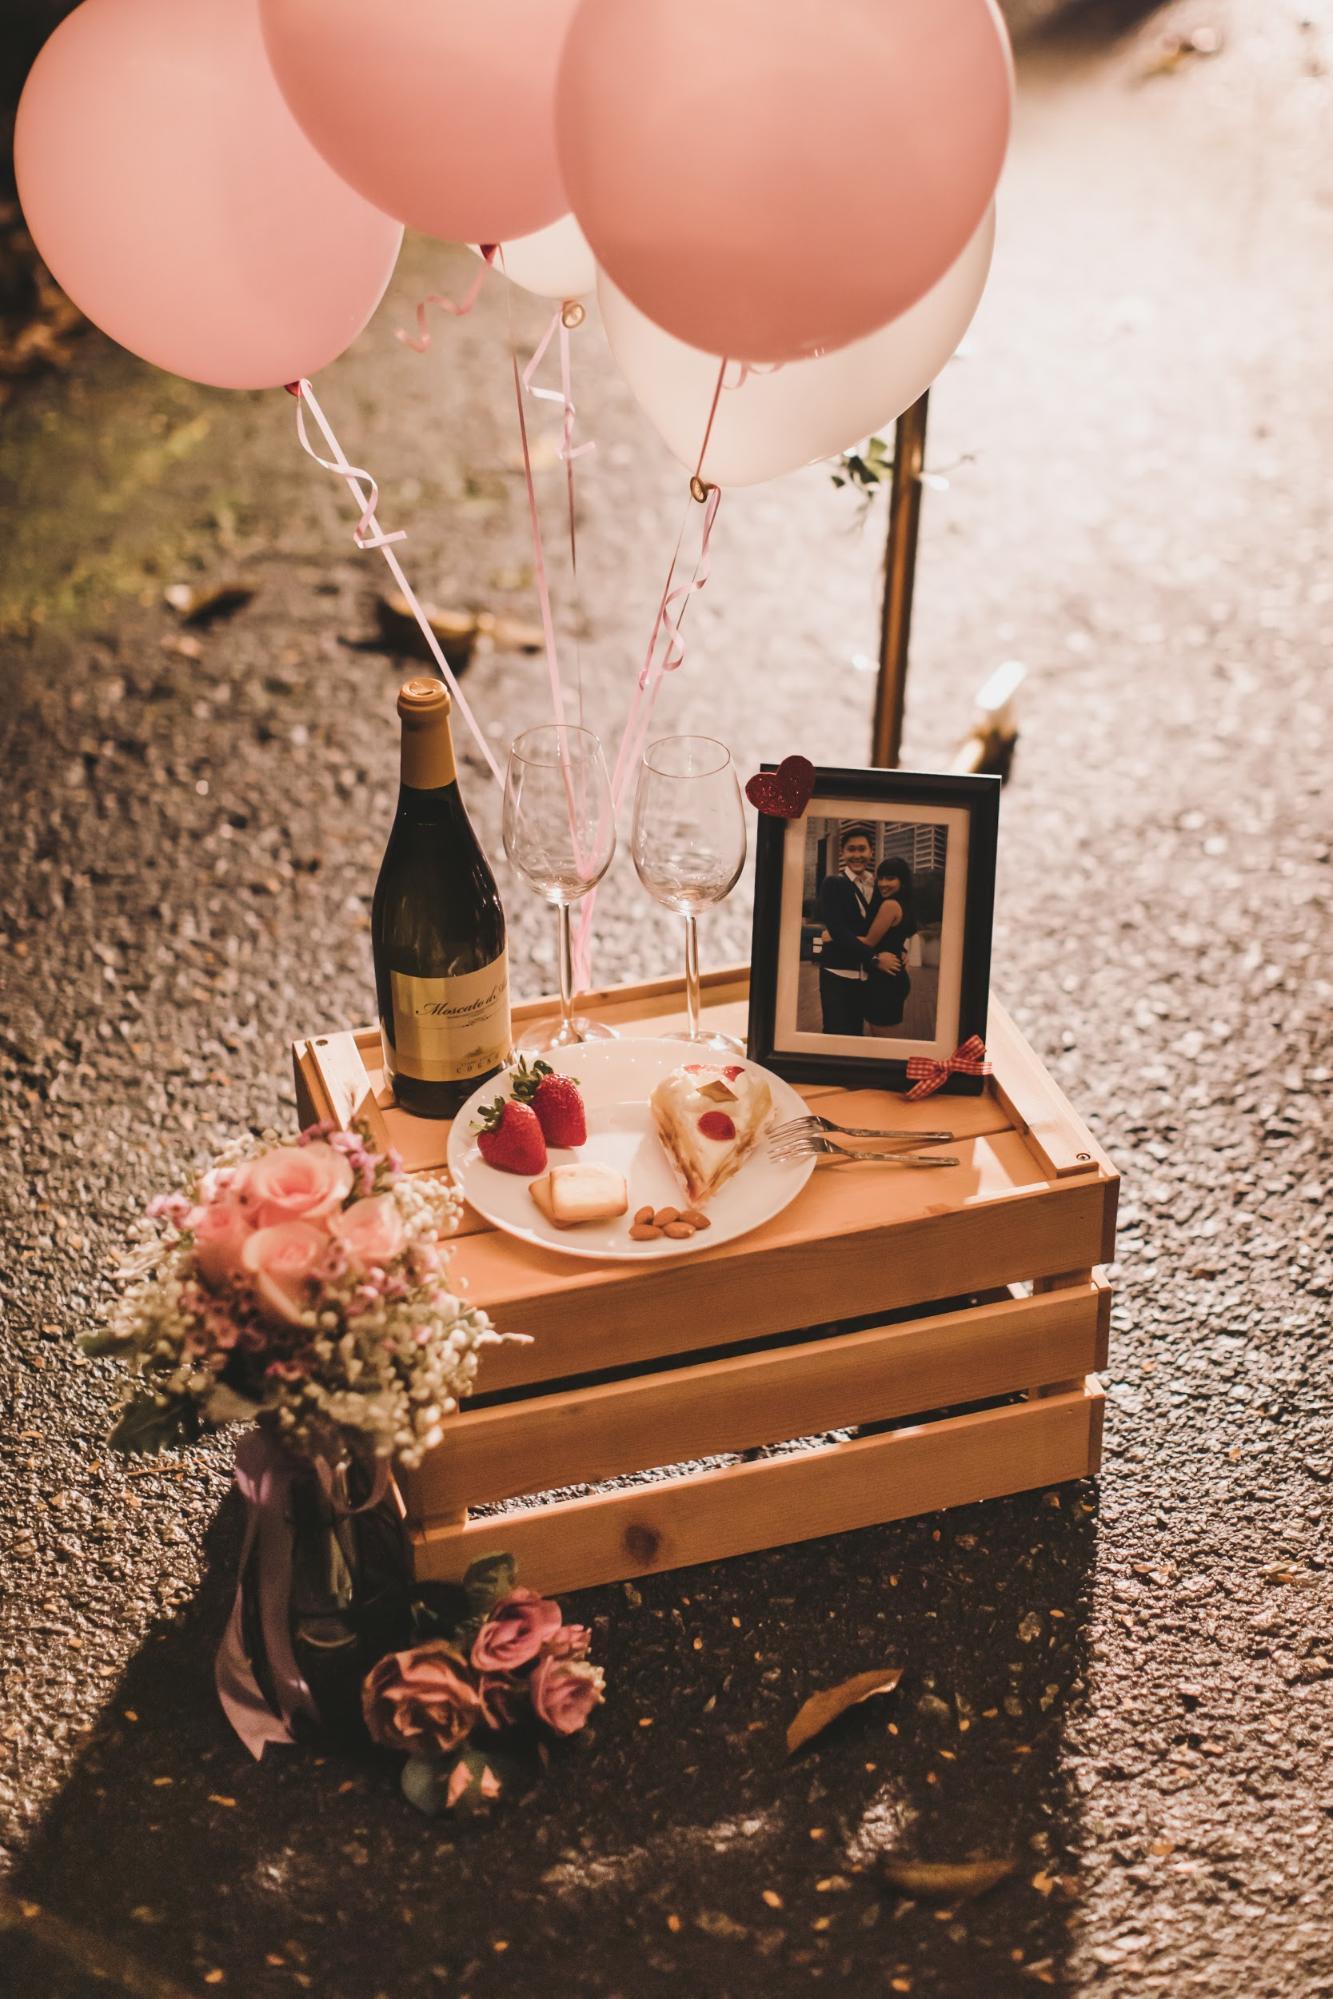 Pre-wedding photoshoot props